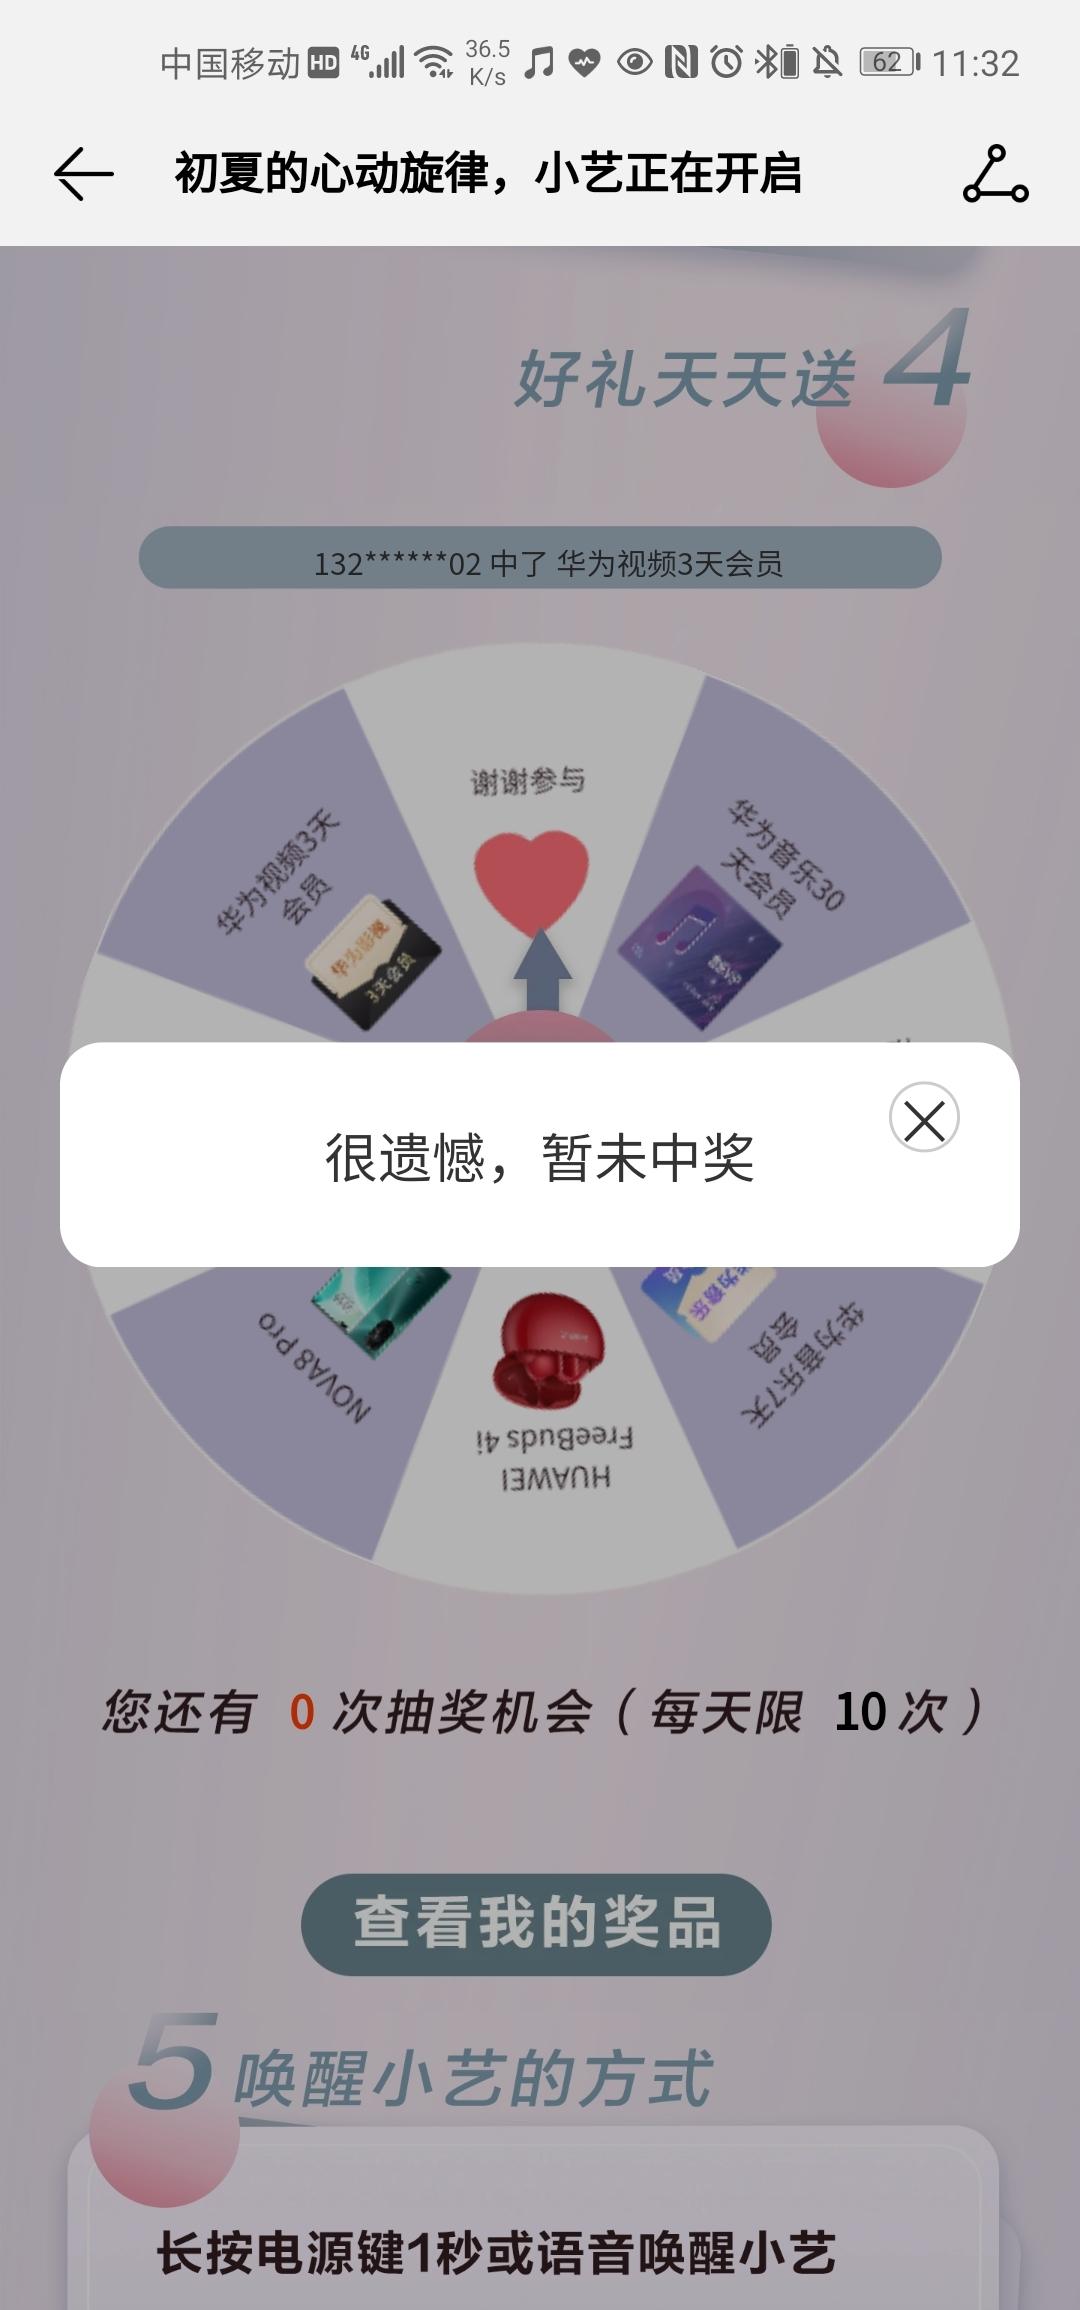 Screenshot_20210514_113200_com.android.mediacenter.jpg